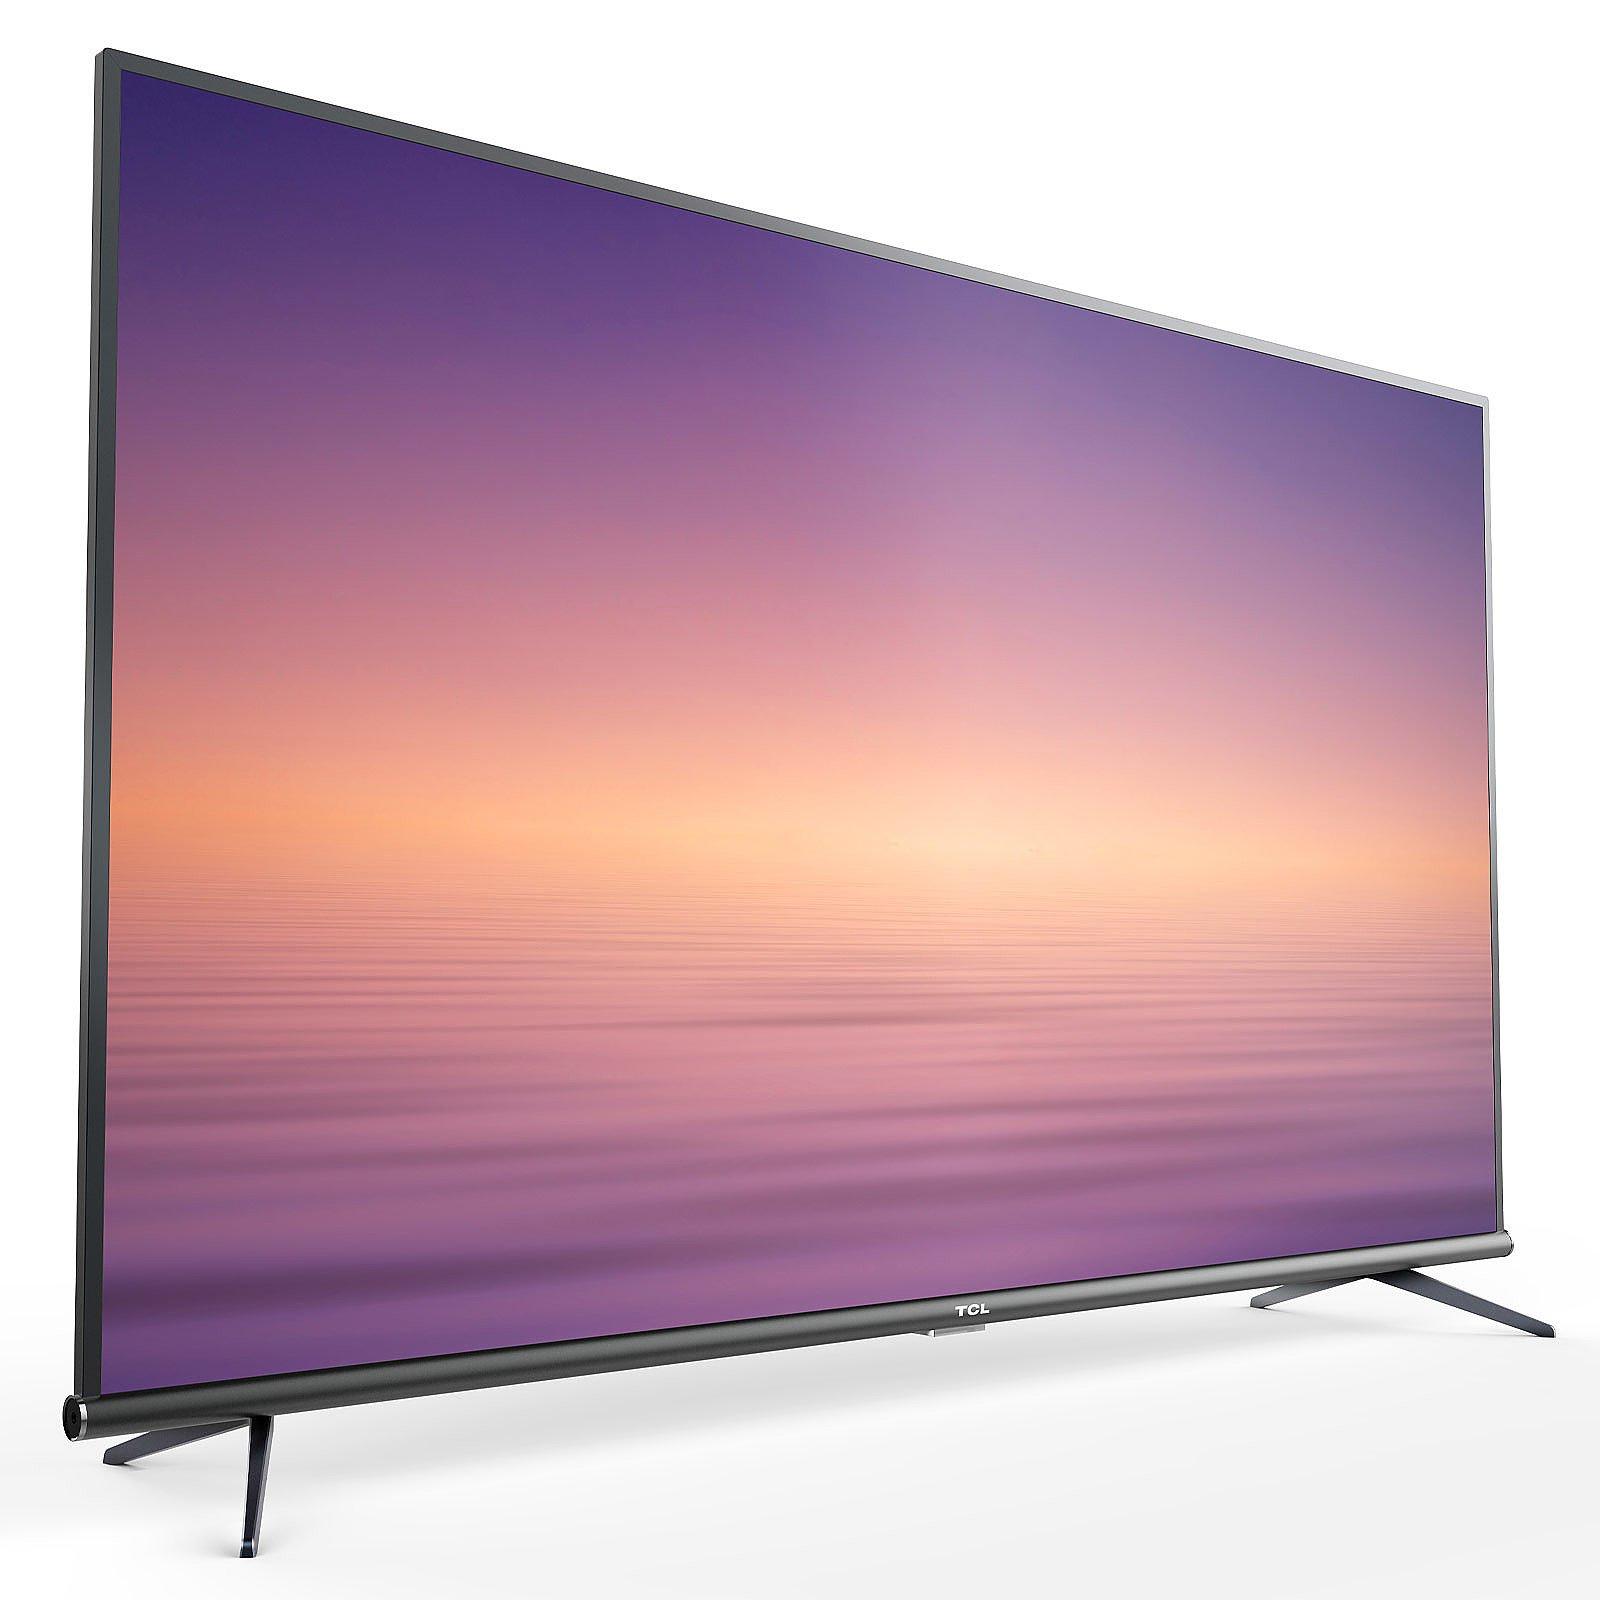 "TV 43"" TCL 43EP663 - LED, 4K UHD, HDR Pro, Android TV (Via ODR de 50€)"